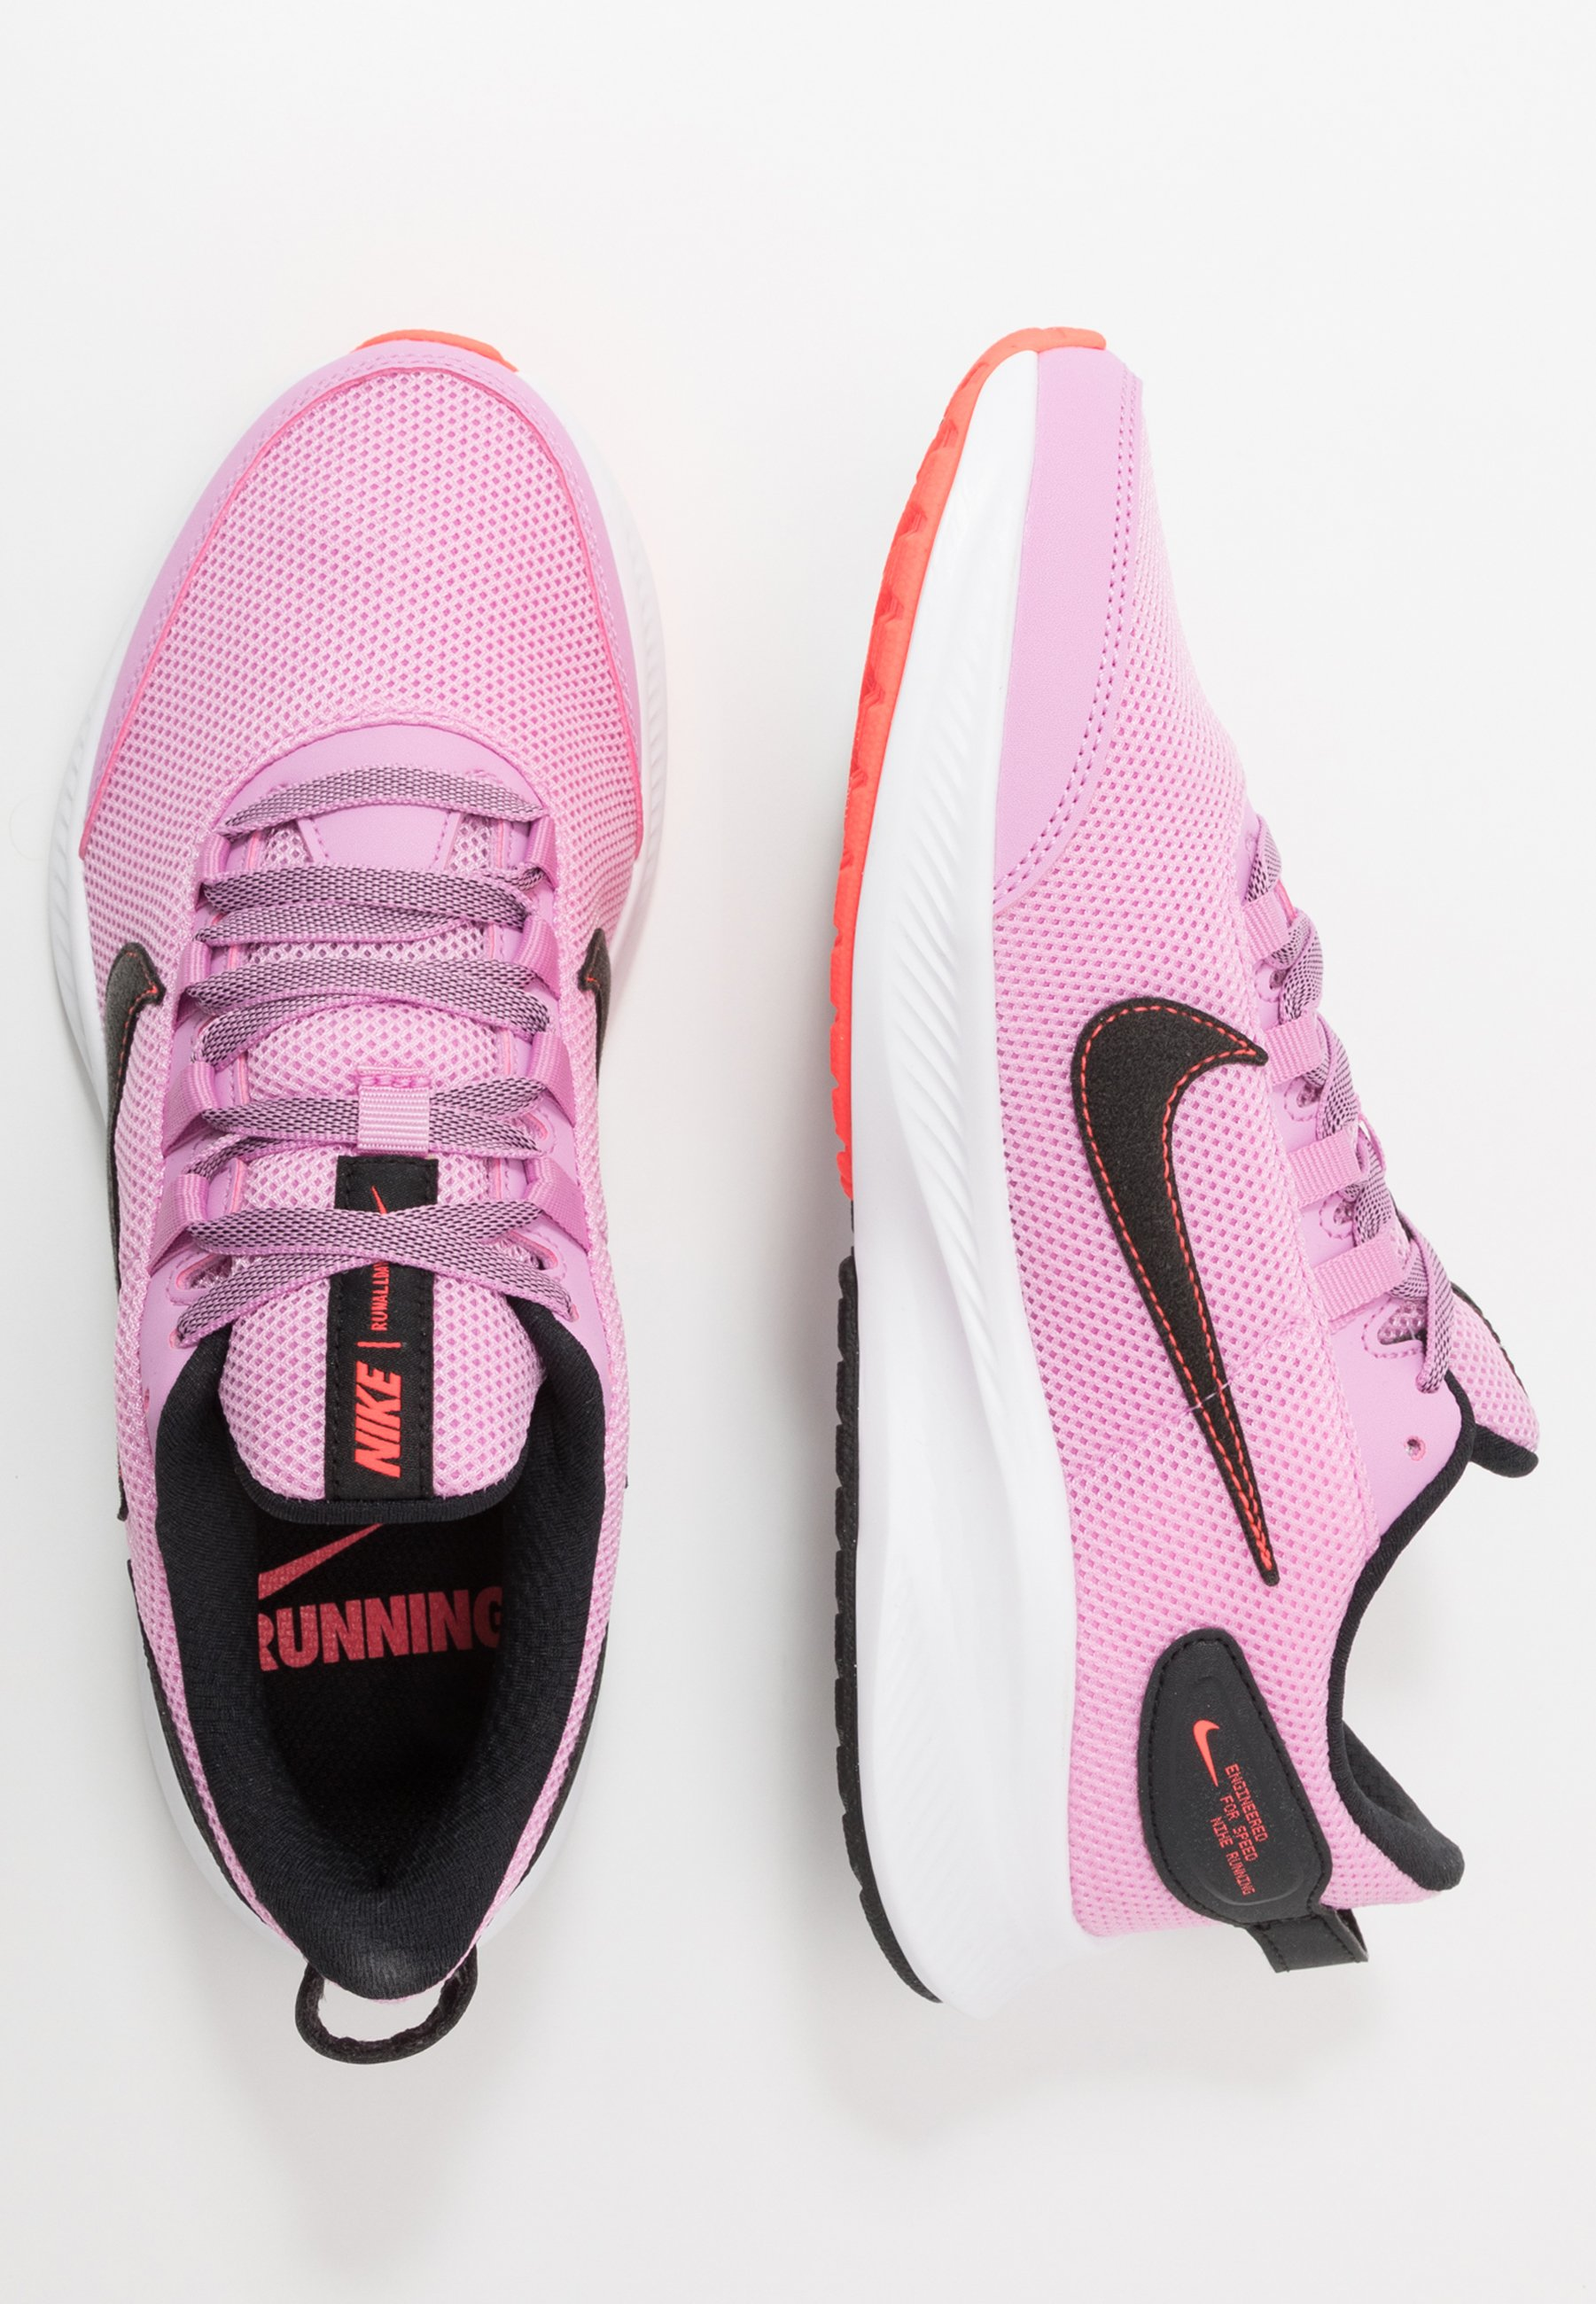 RUNALLDAY 2 Scarpe running neutre beyond pinkblackflash crimson